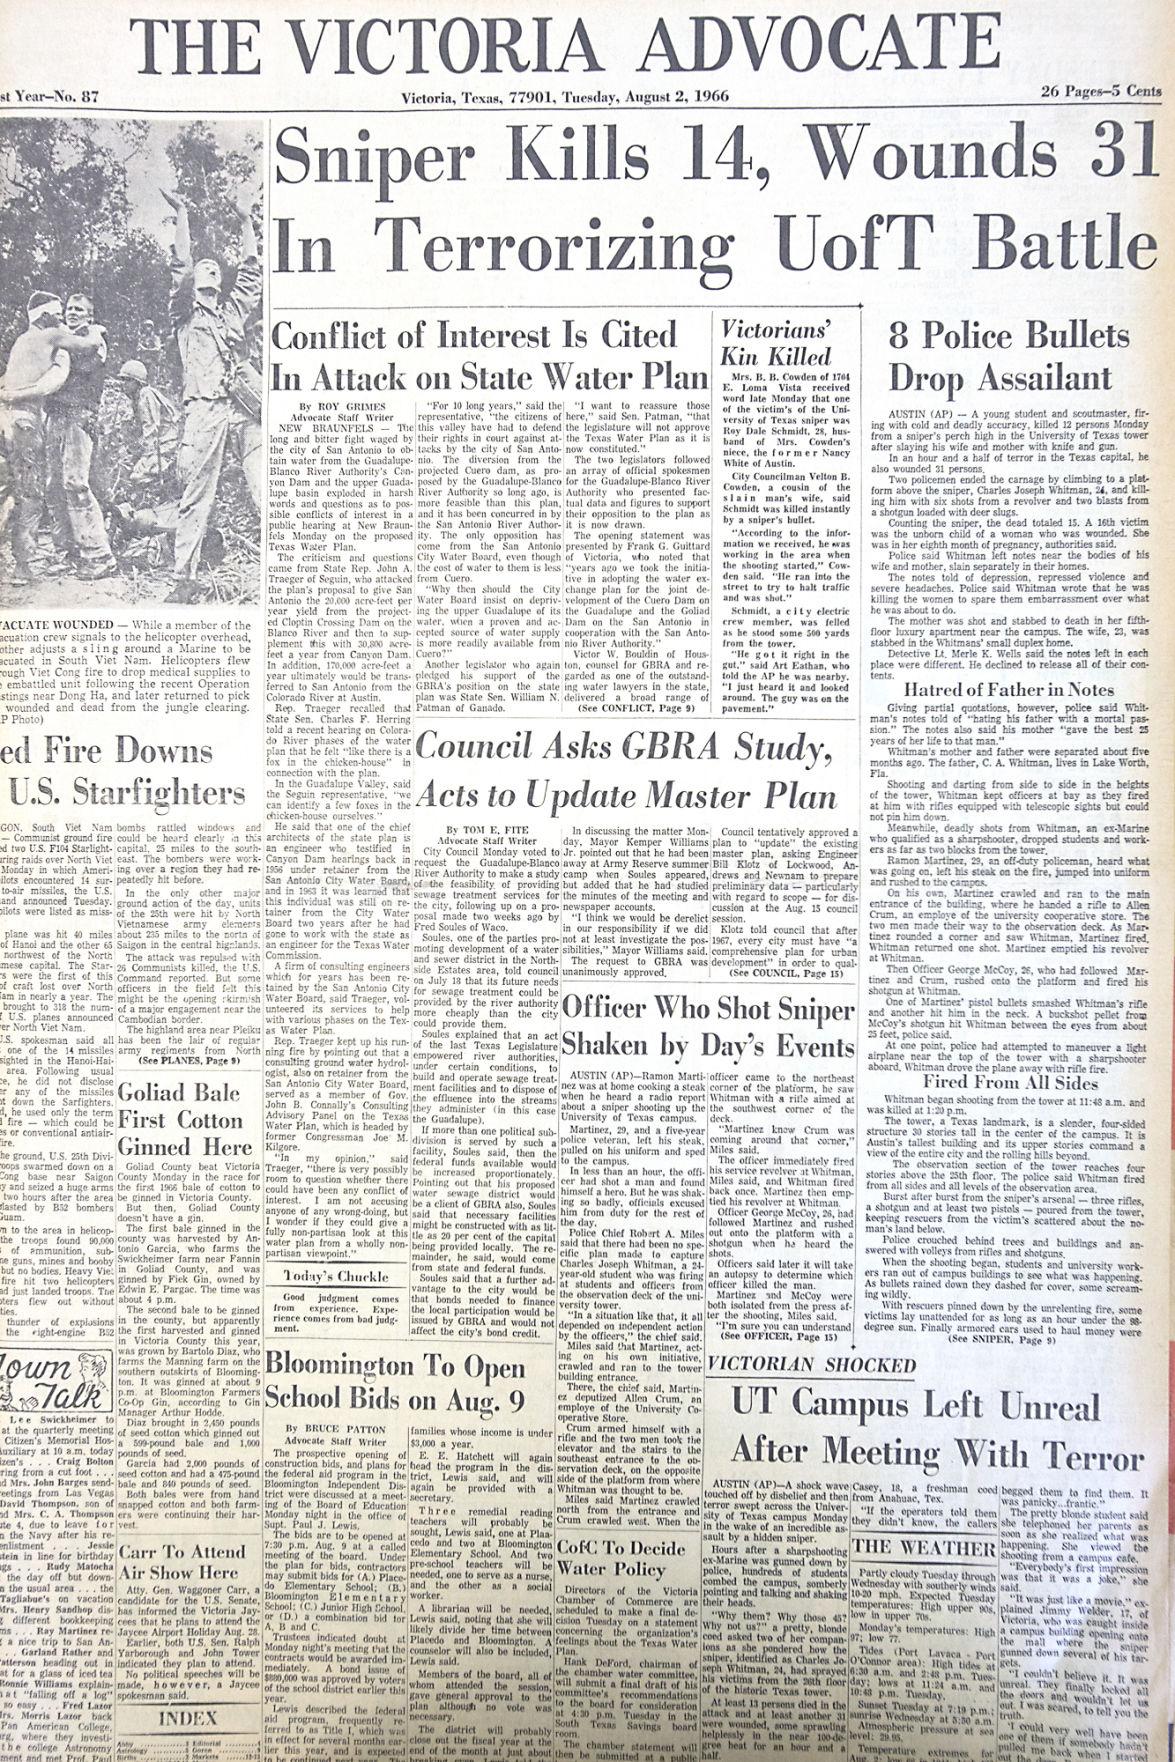 Victoria couple recalls 1966 UT mass killing | Entertainment